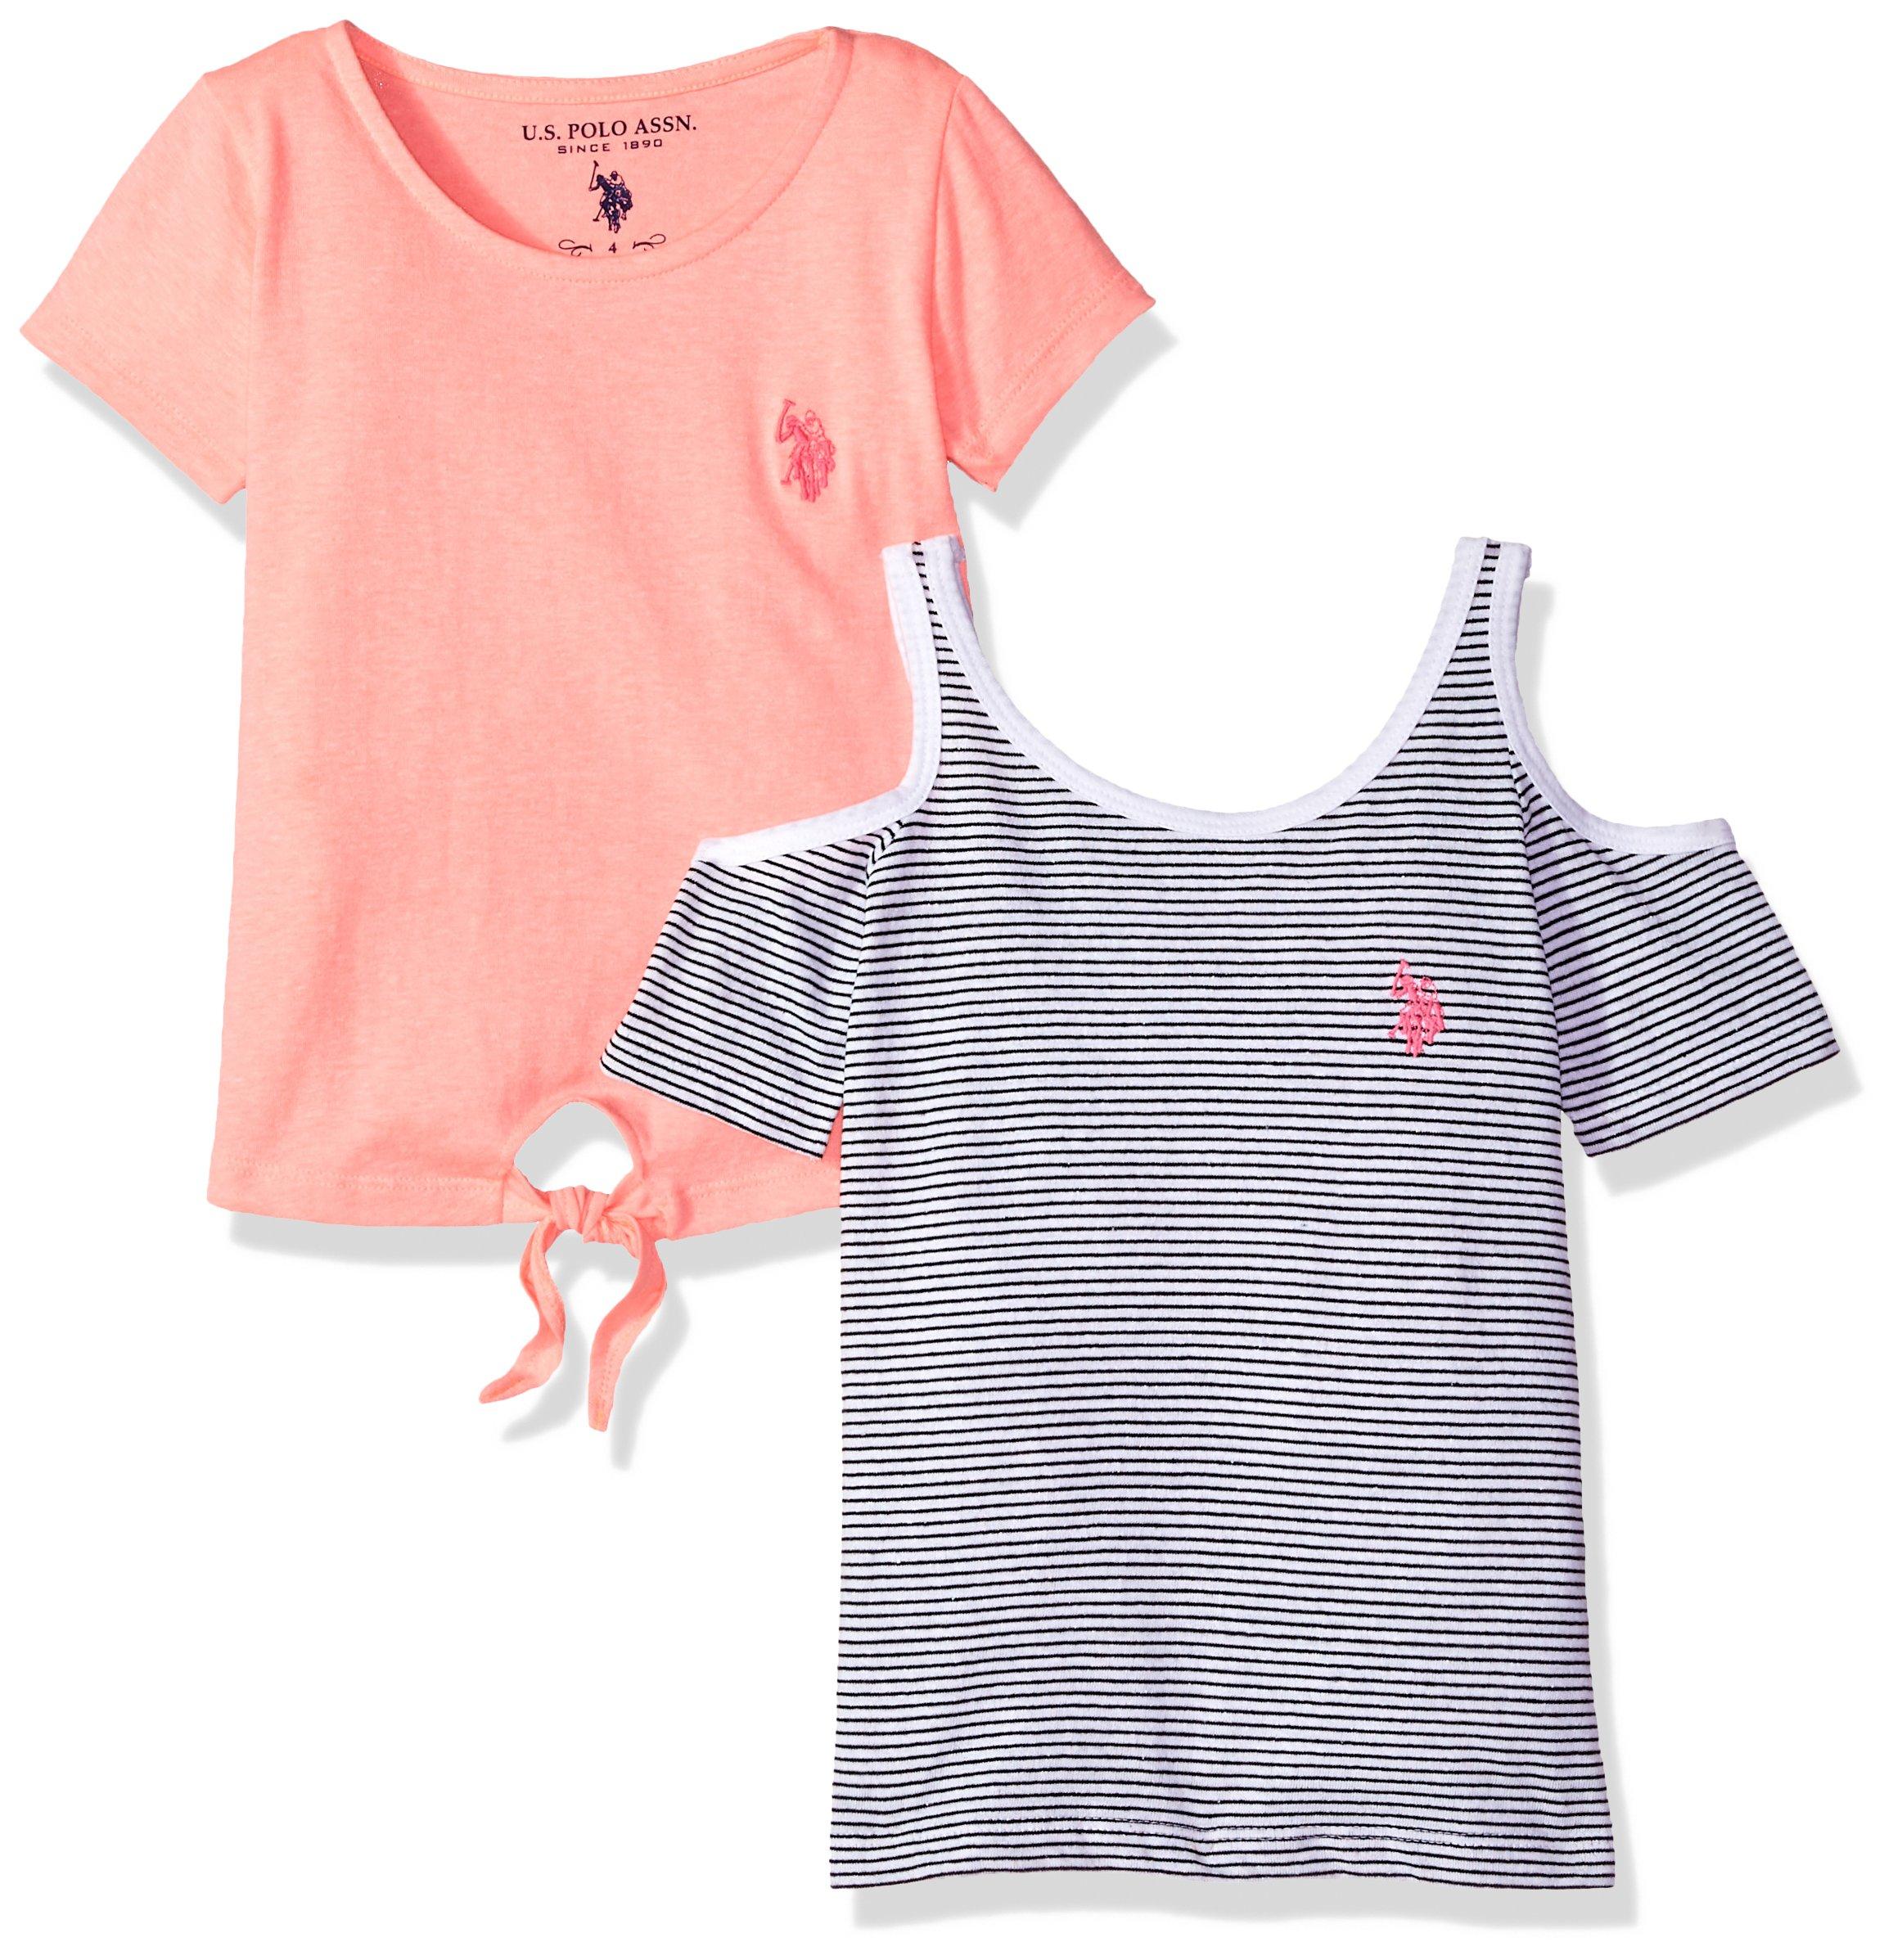 U.S. Polo Assn. Little Girls' T-Shirt and Tank Shirt Pack, Black/White Stripe Neon Coral Jersey Multi, 5/6